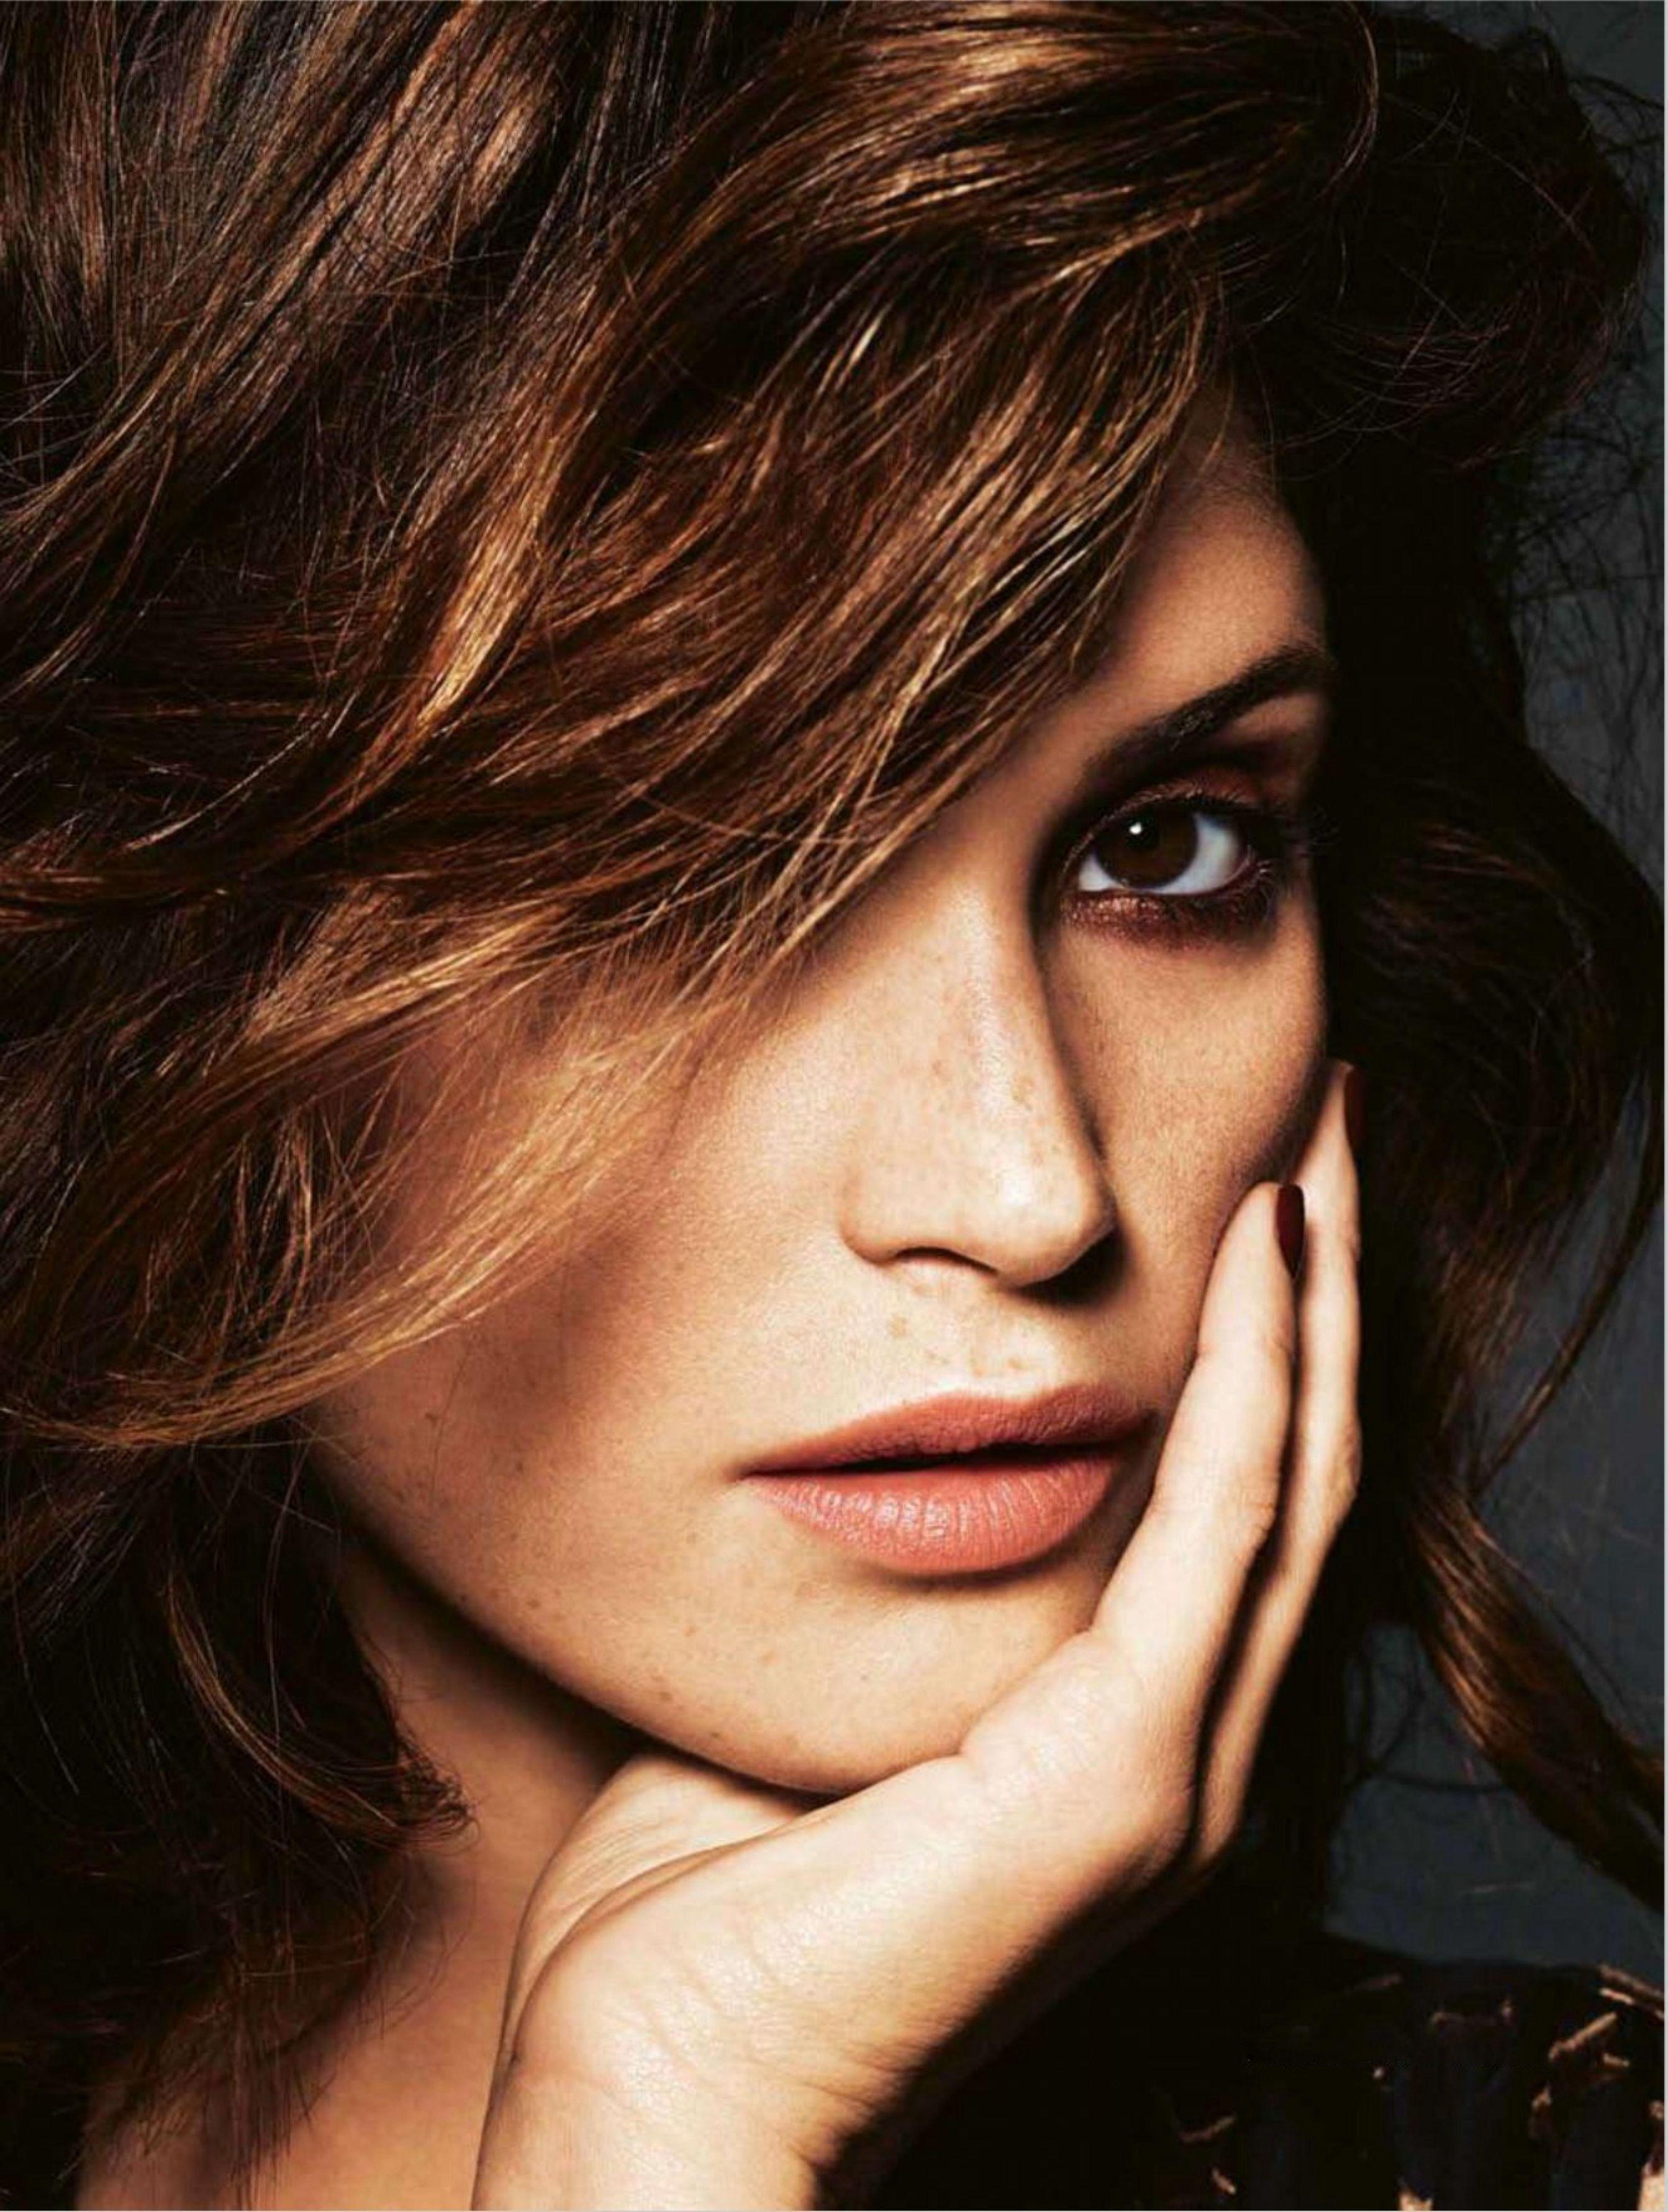 Gemma Arterton by Chris Craymer - February 15th, 2015